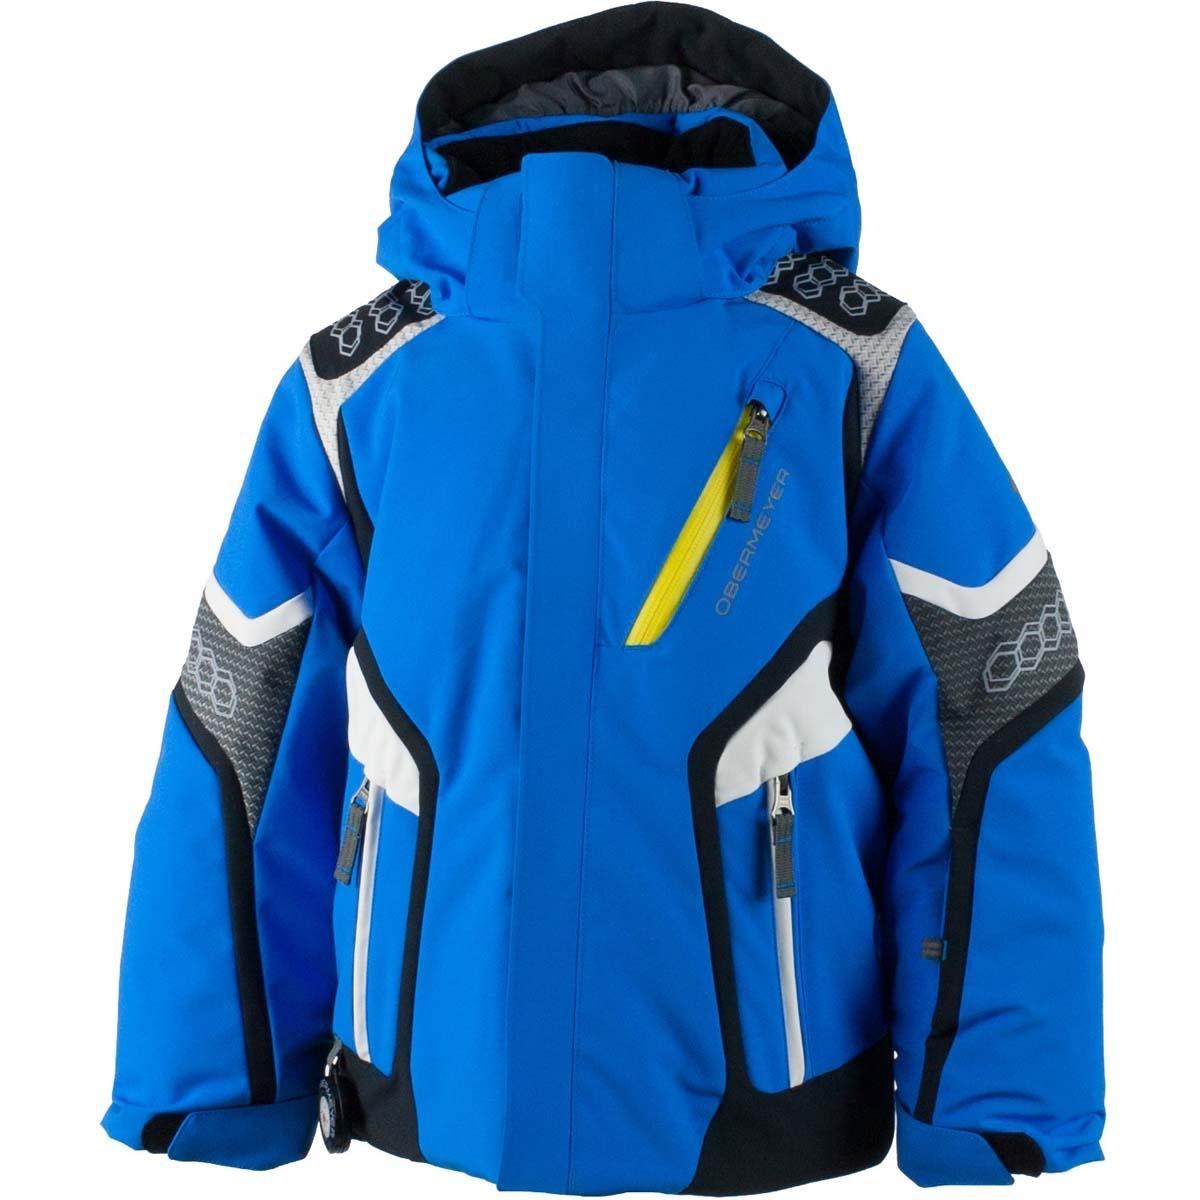 Obermeyer Kids Baby Boy's Cobra Jacket (Toddler/Little Kids/Big Kids) Stellar Blue 7